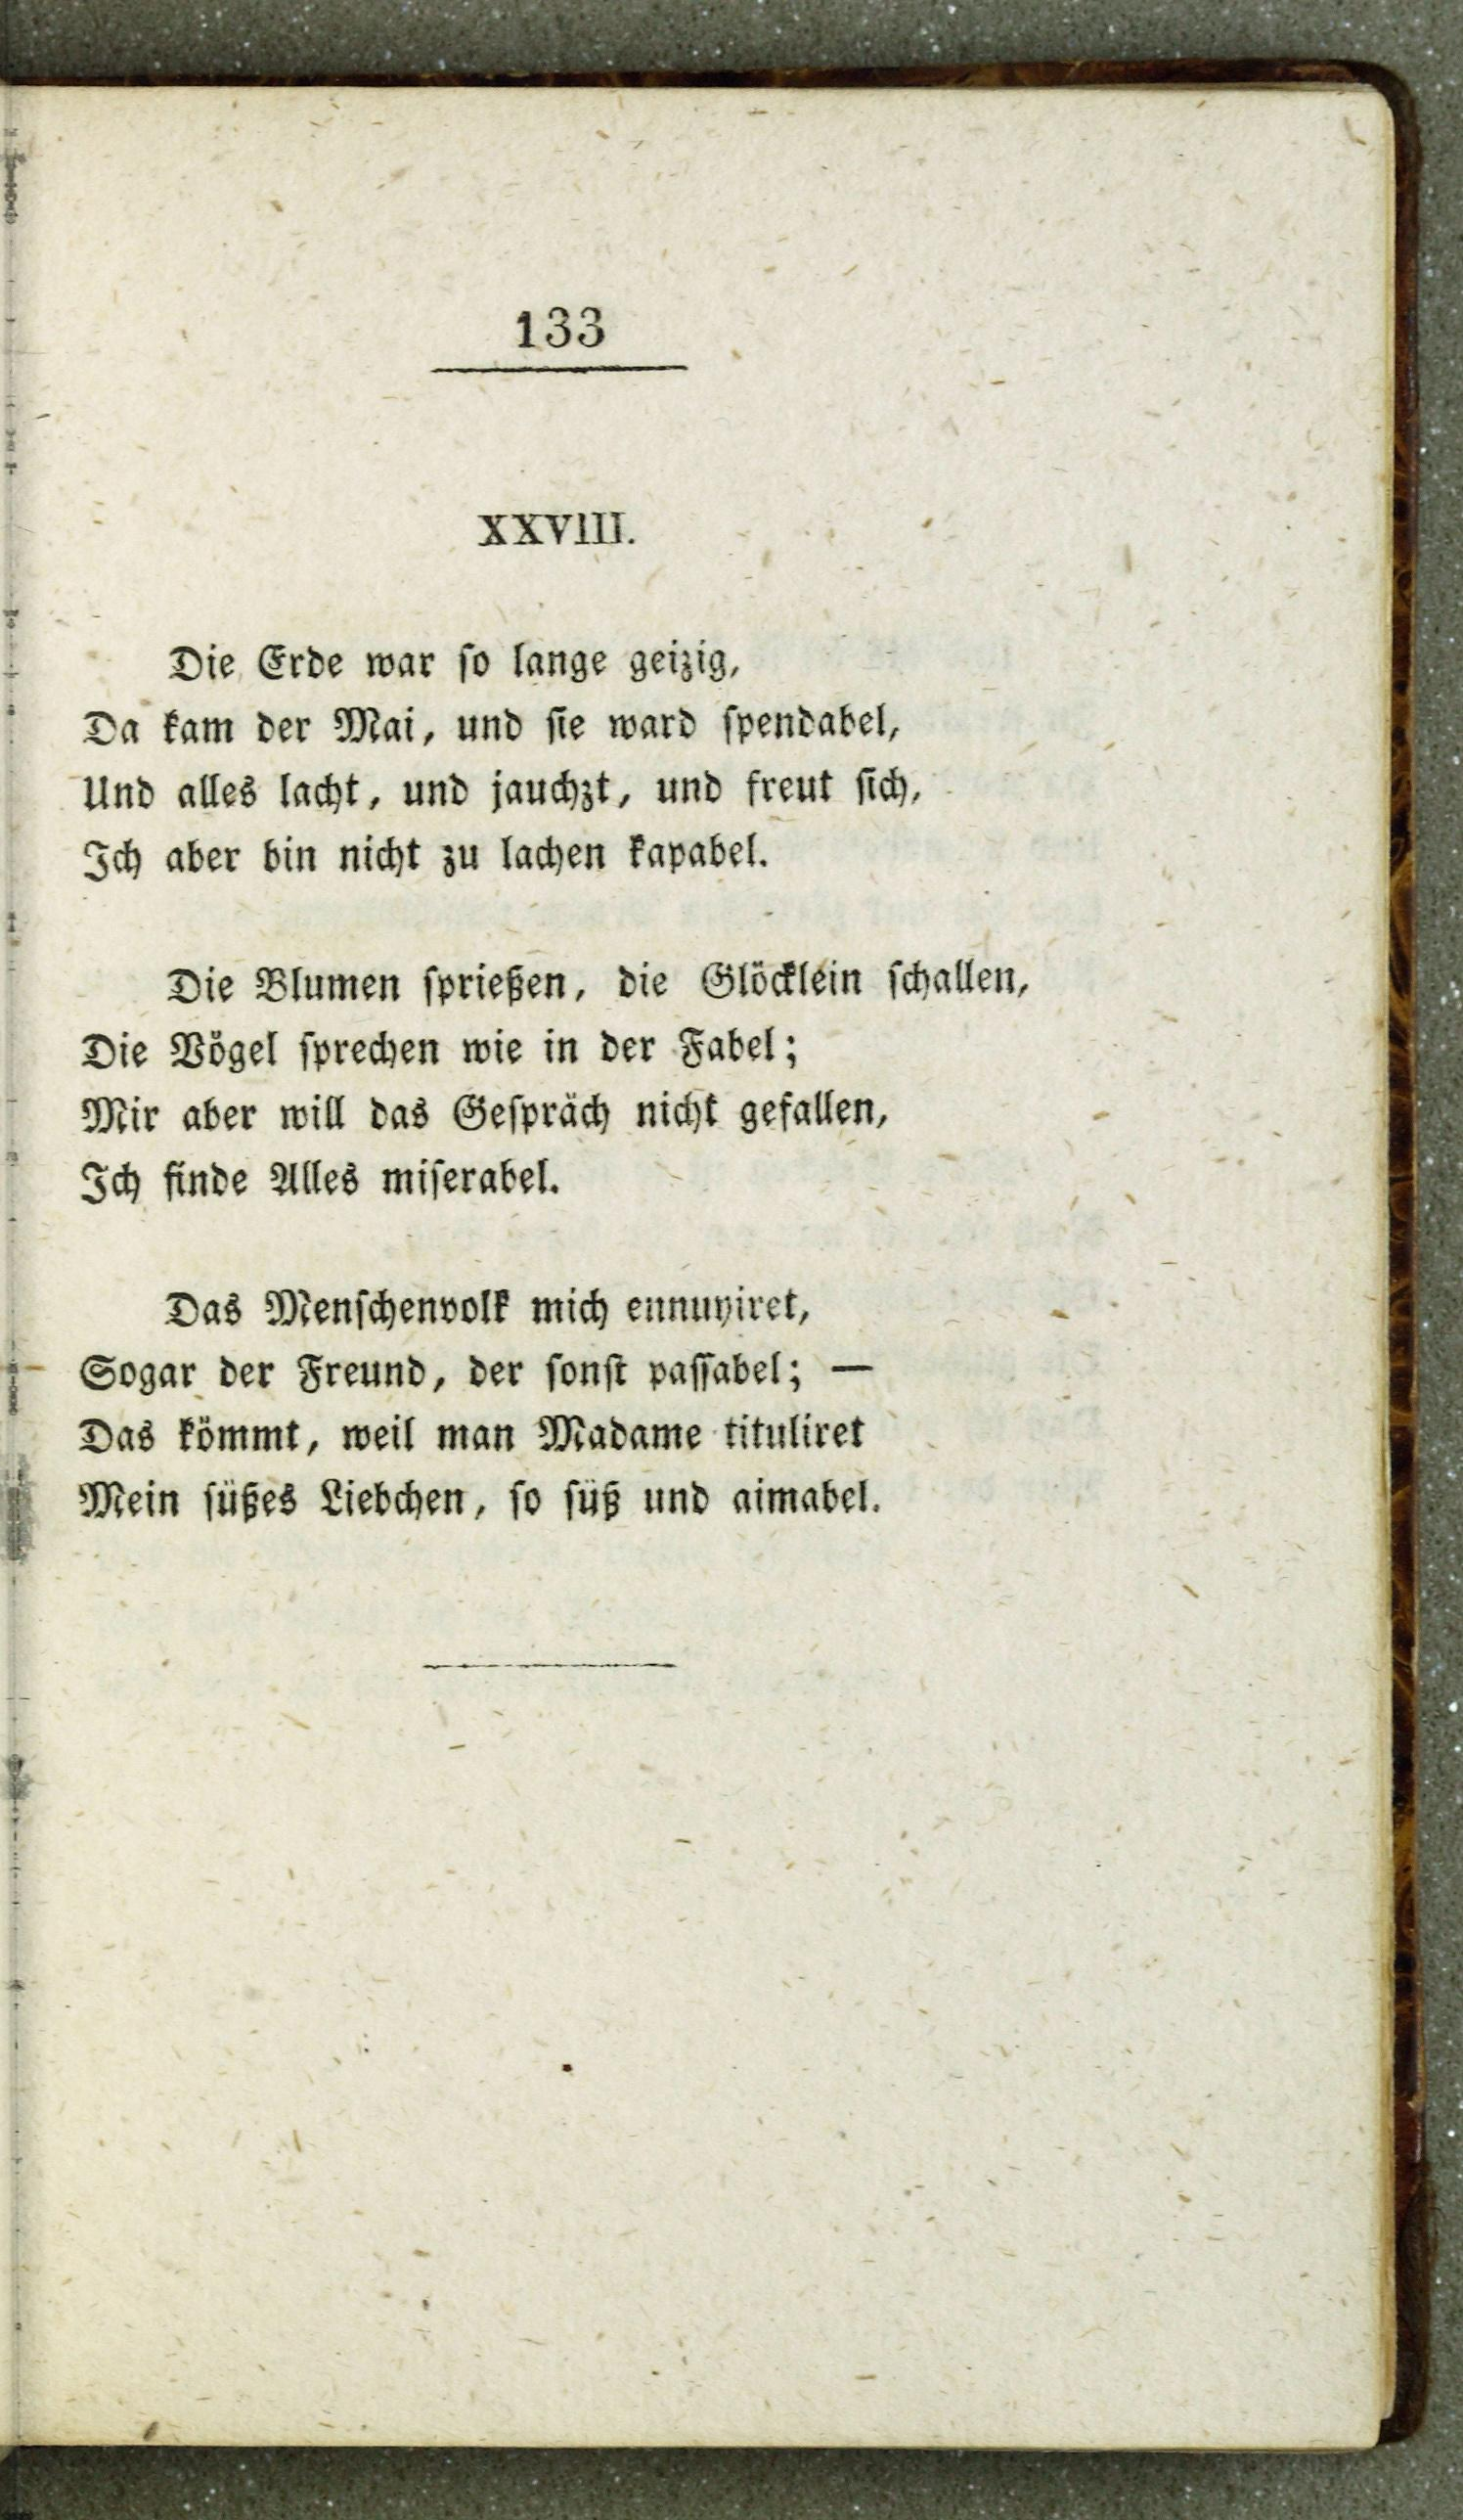 Charmant Buchvorlage Für Publisher Bilder - Entry Level Resume ...